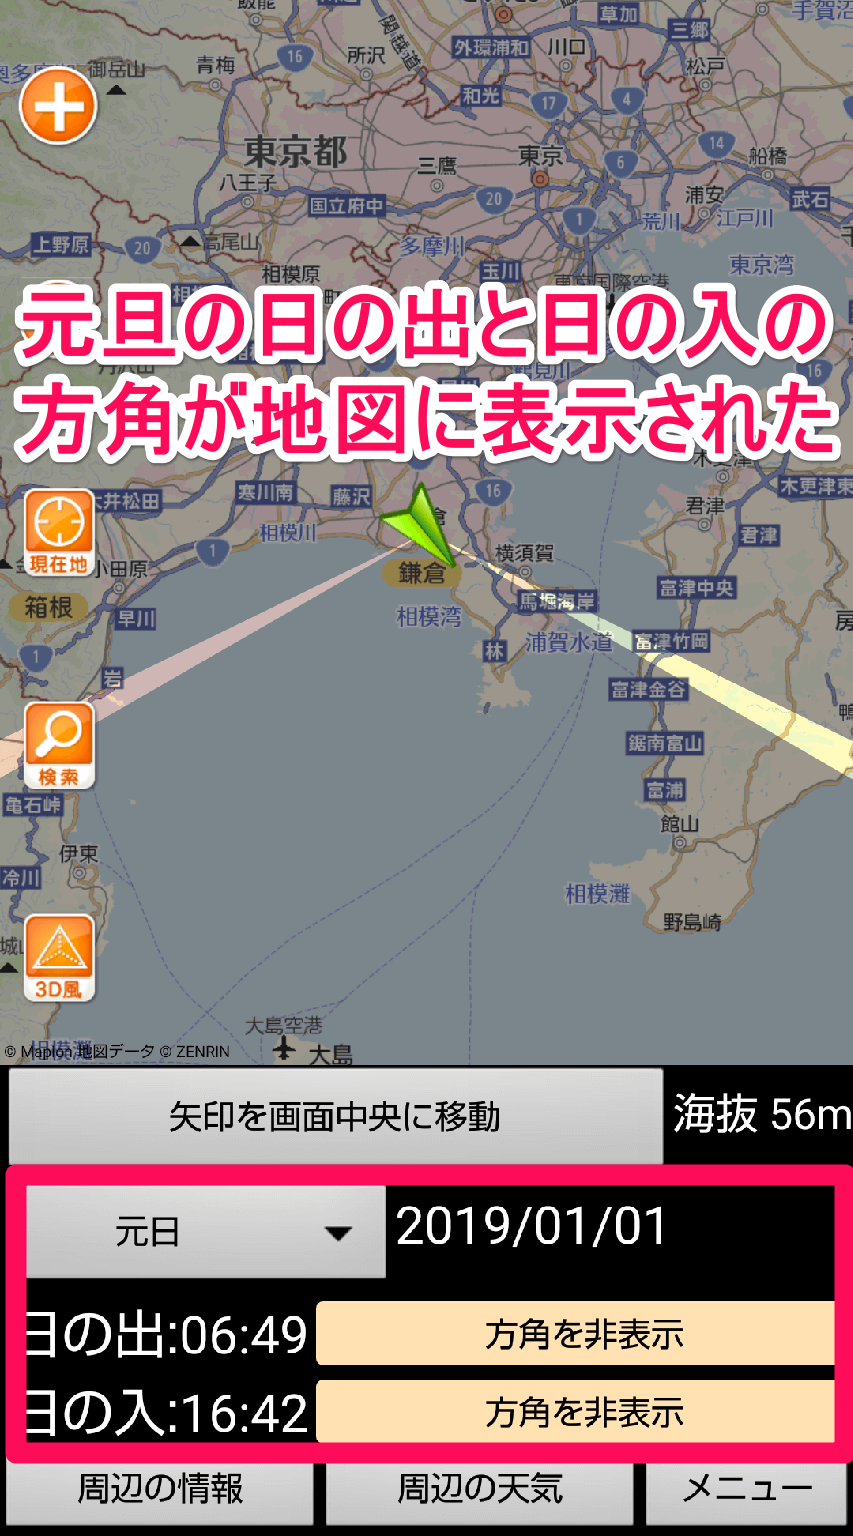 Android(アンドロイド)版[日の出日の入マピオン]アプリで地図に任意の場所を表示した画面